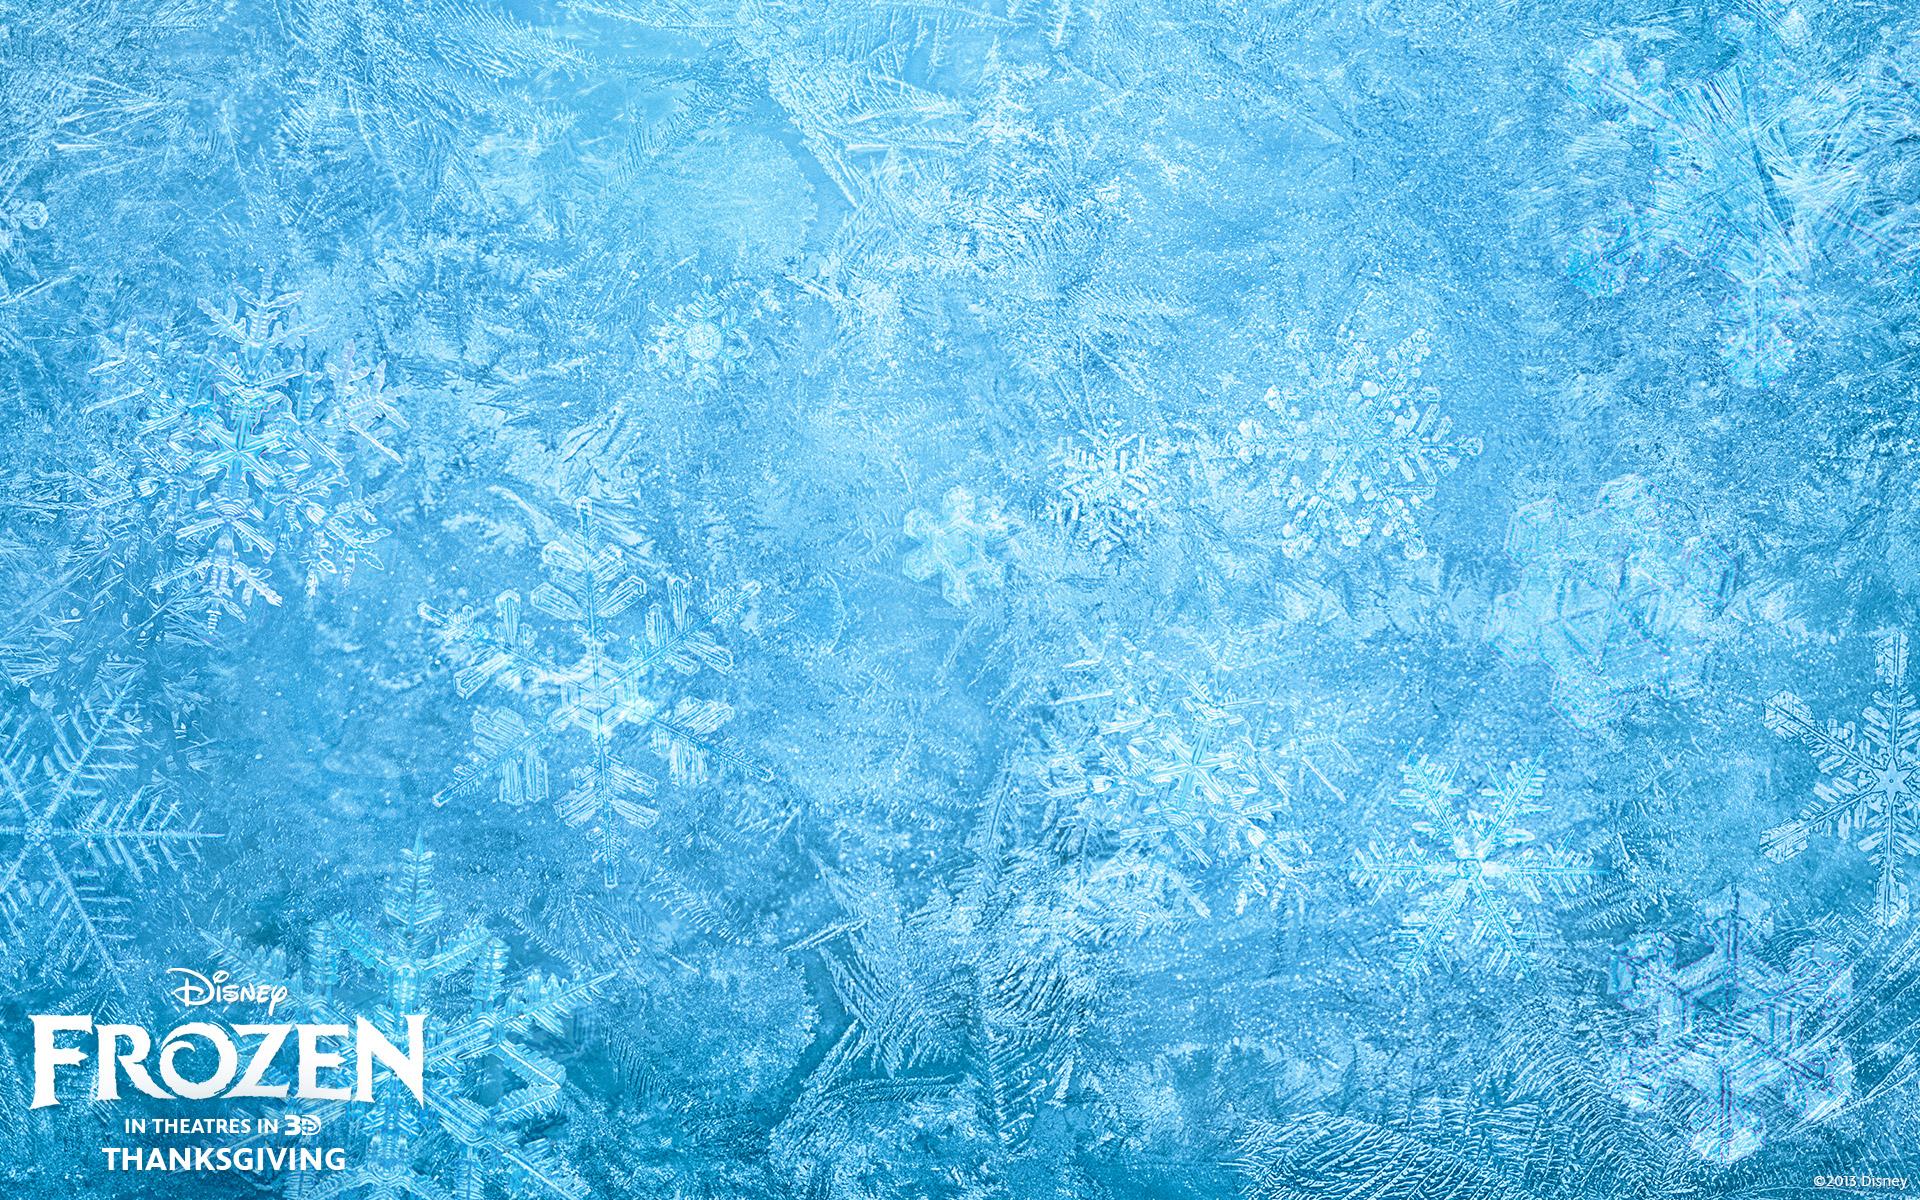 movie Frozen Disneys Frozen CG animated movie wallpaper image 1920x1200